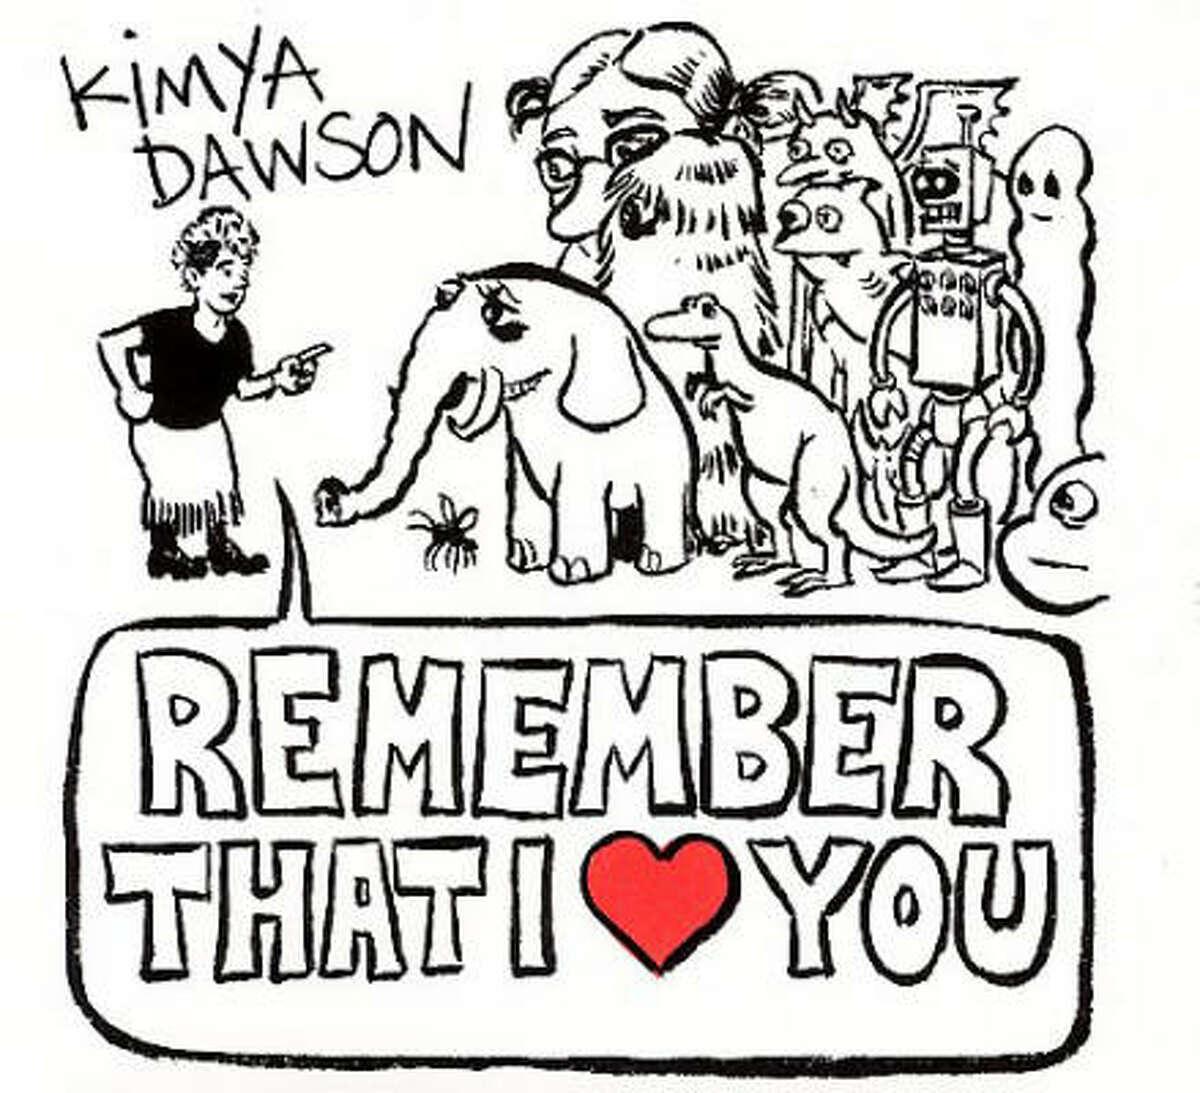 Kimya Dawson's Remember That I Love You